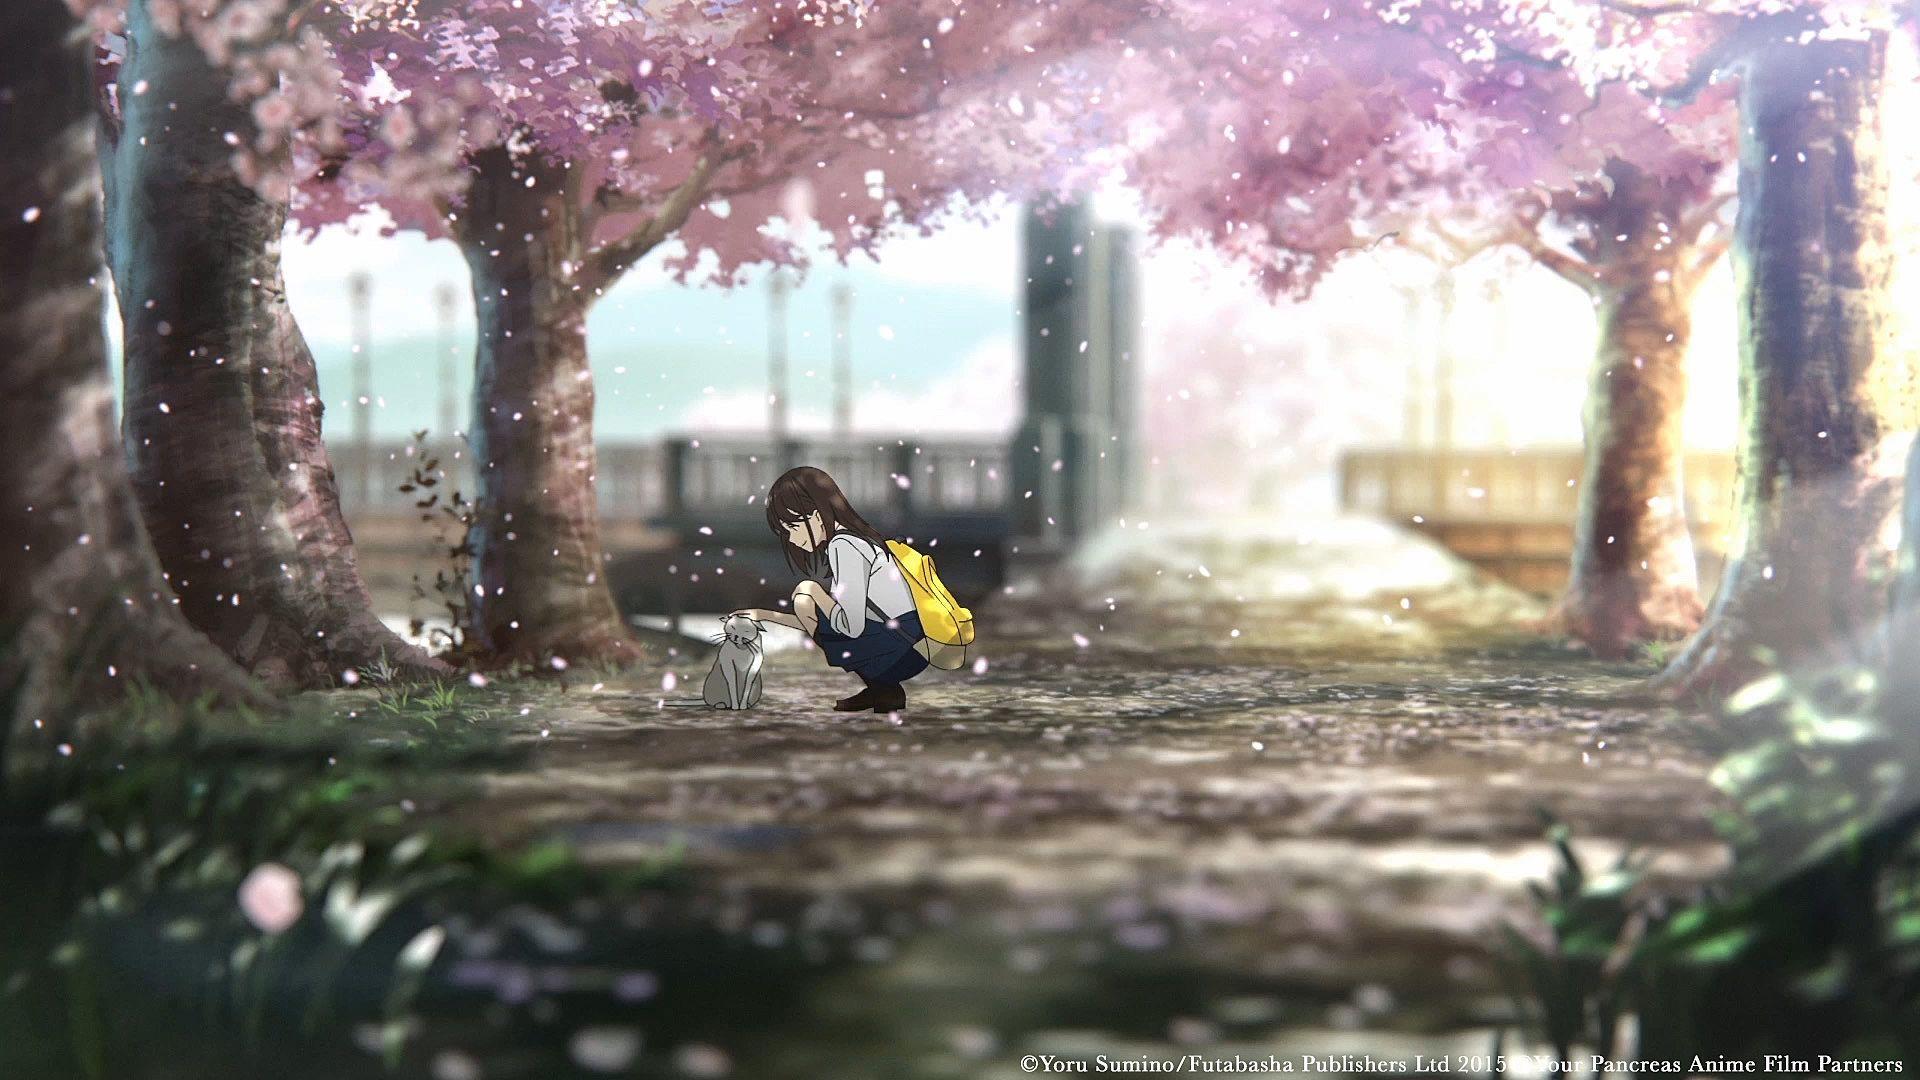 Anime, i want to eat your pancreas, haruki shiga, sakura yamauchi, hd wallpaper · keywords: I Want To Eat Your Pancreas Anime HD Wallpapers ...